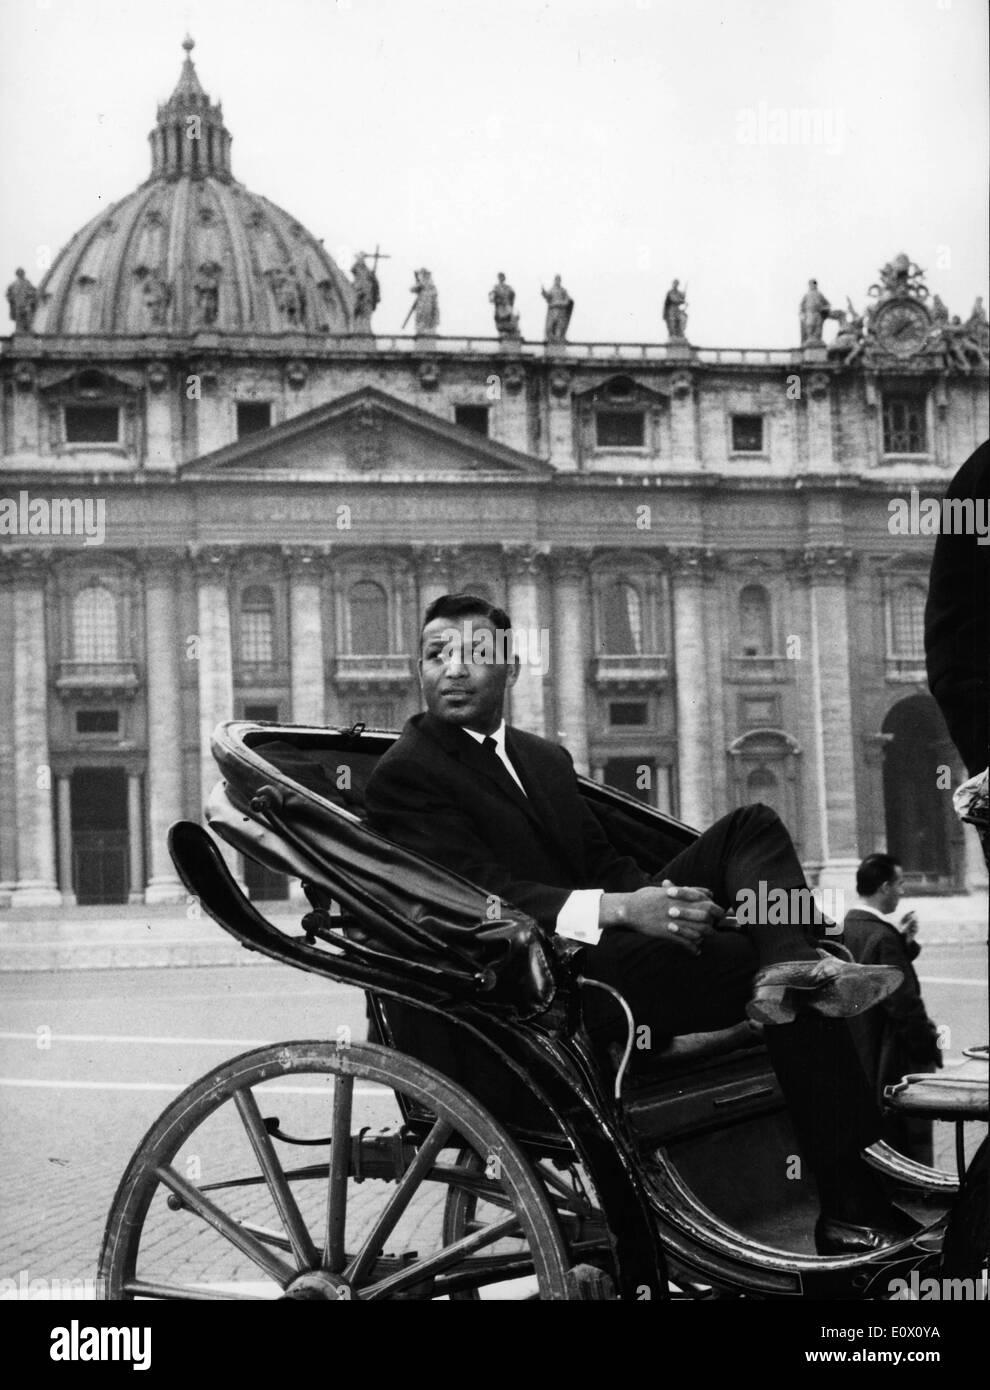 Boxer 'Sugar' Ray Robinson on a tour around Rome - Stock Image